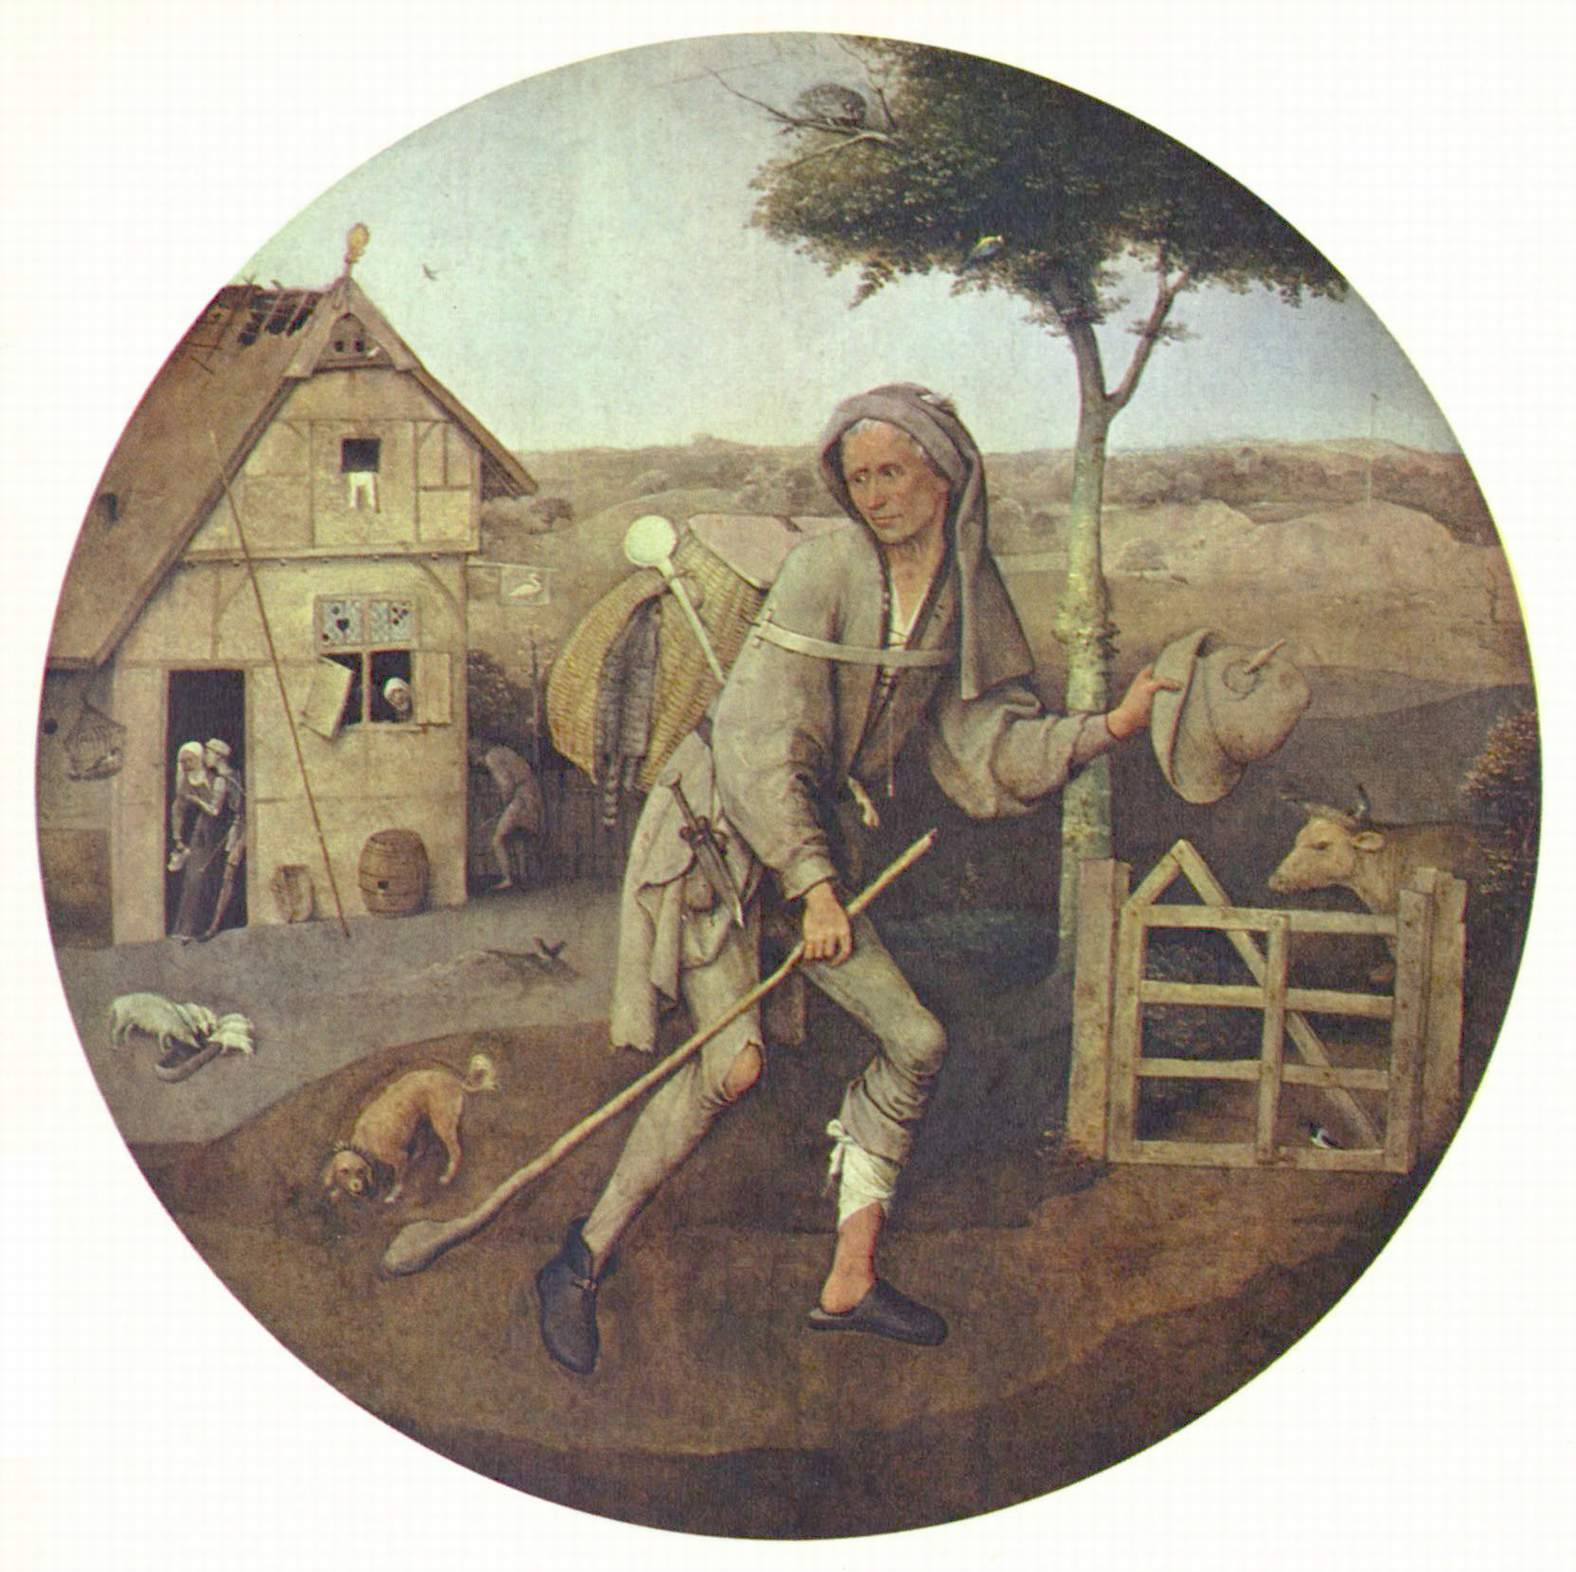 De Marskramer, Hieronymus Bosch